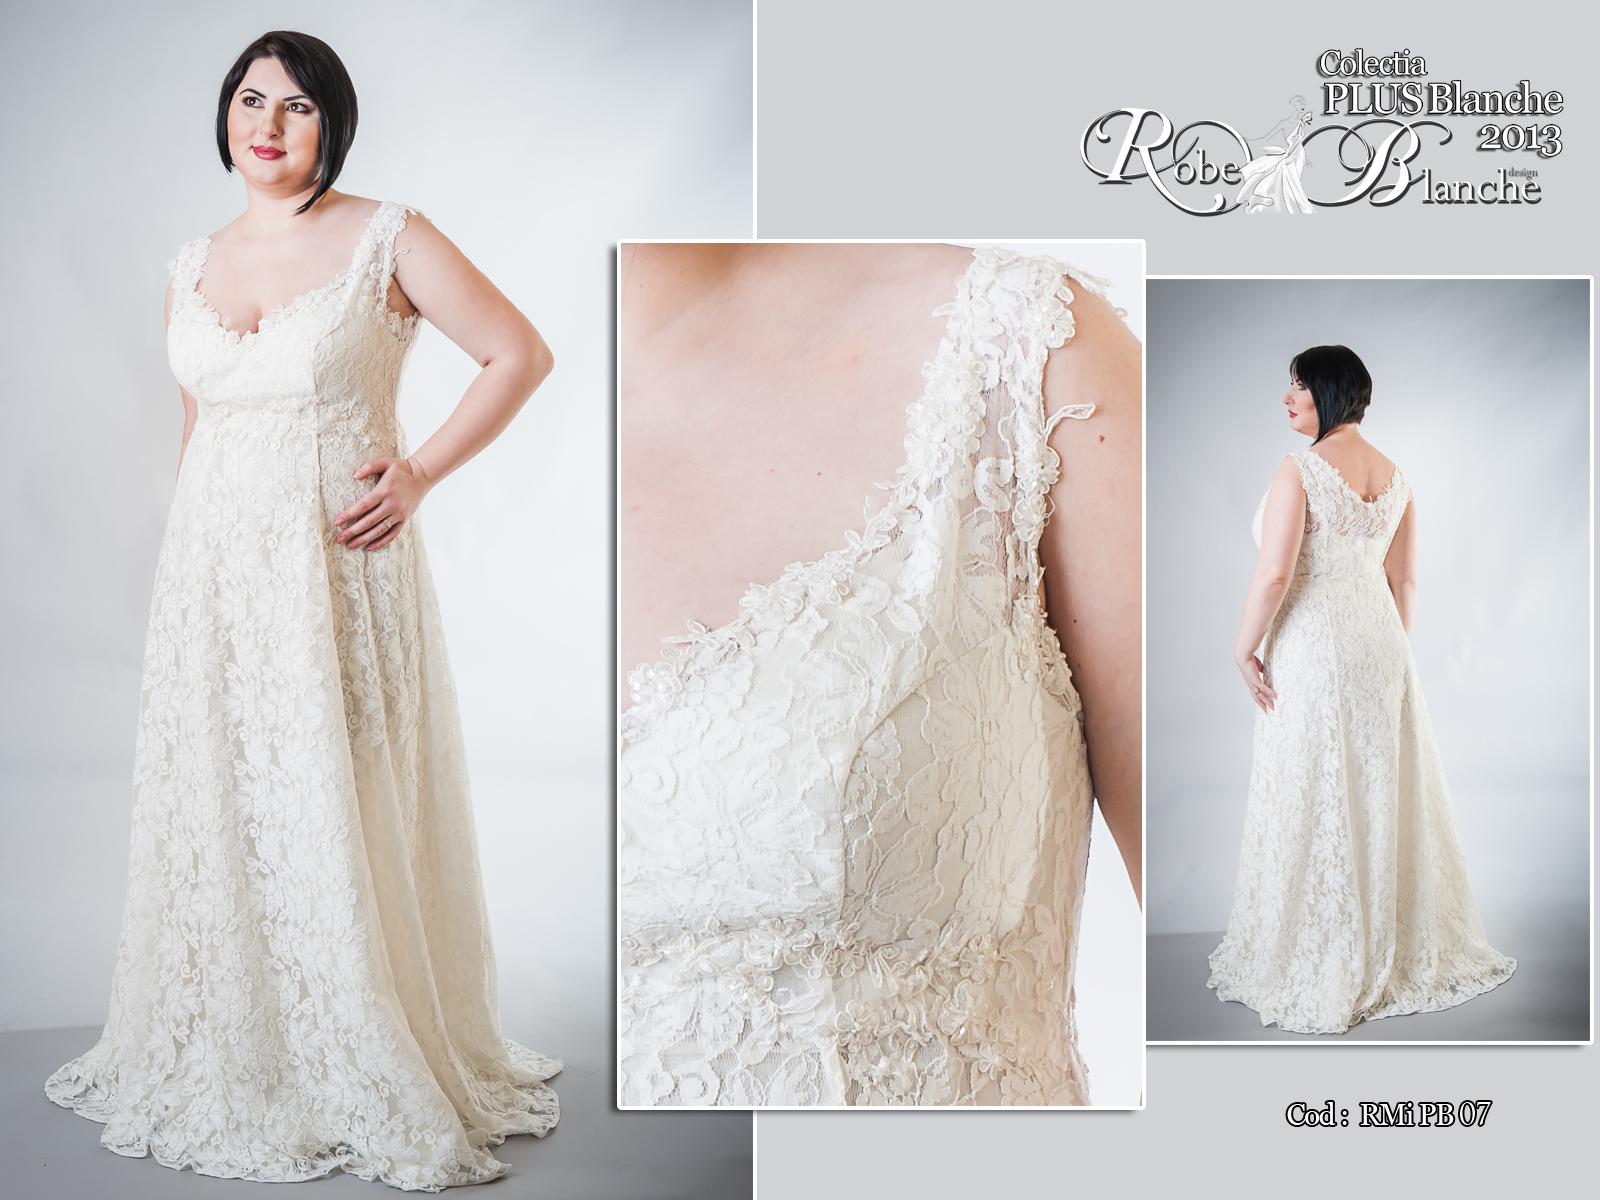 Robe Blanche Design Blog Stiluri De Rochii Rochia De Mireasa Stil